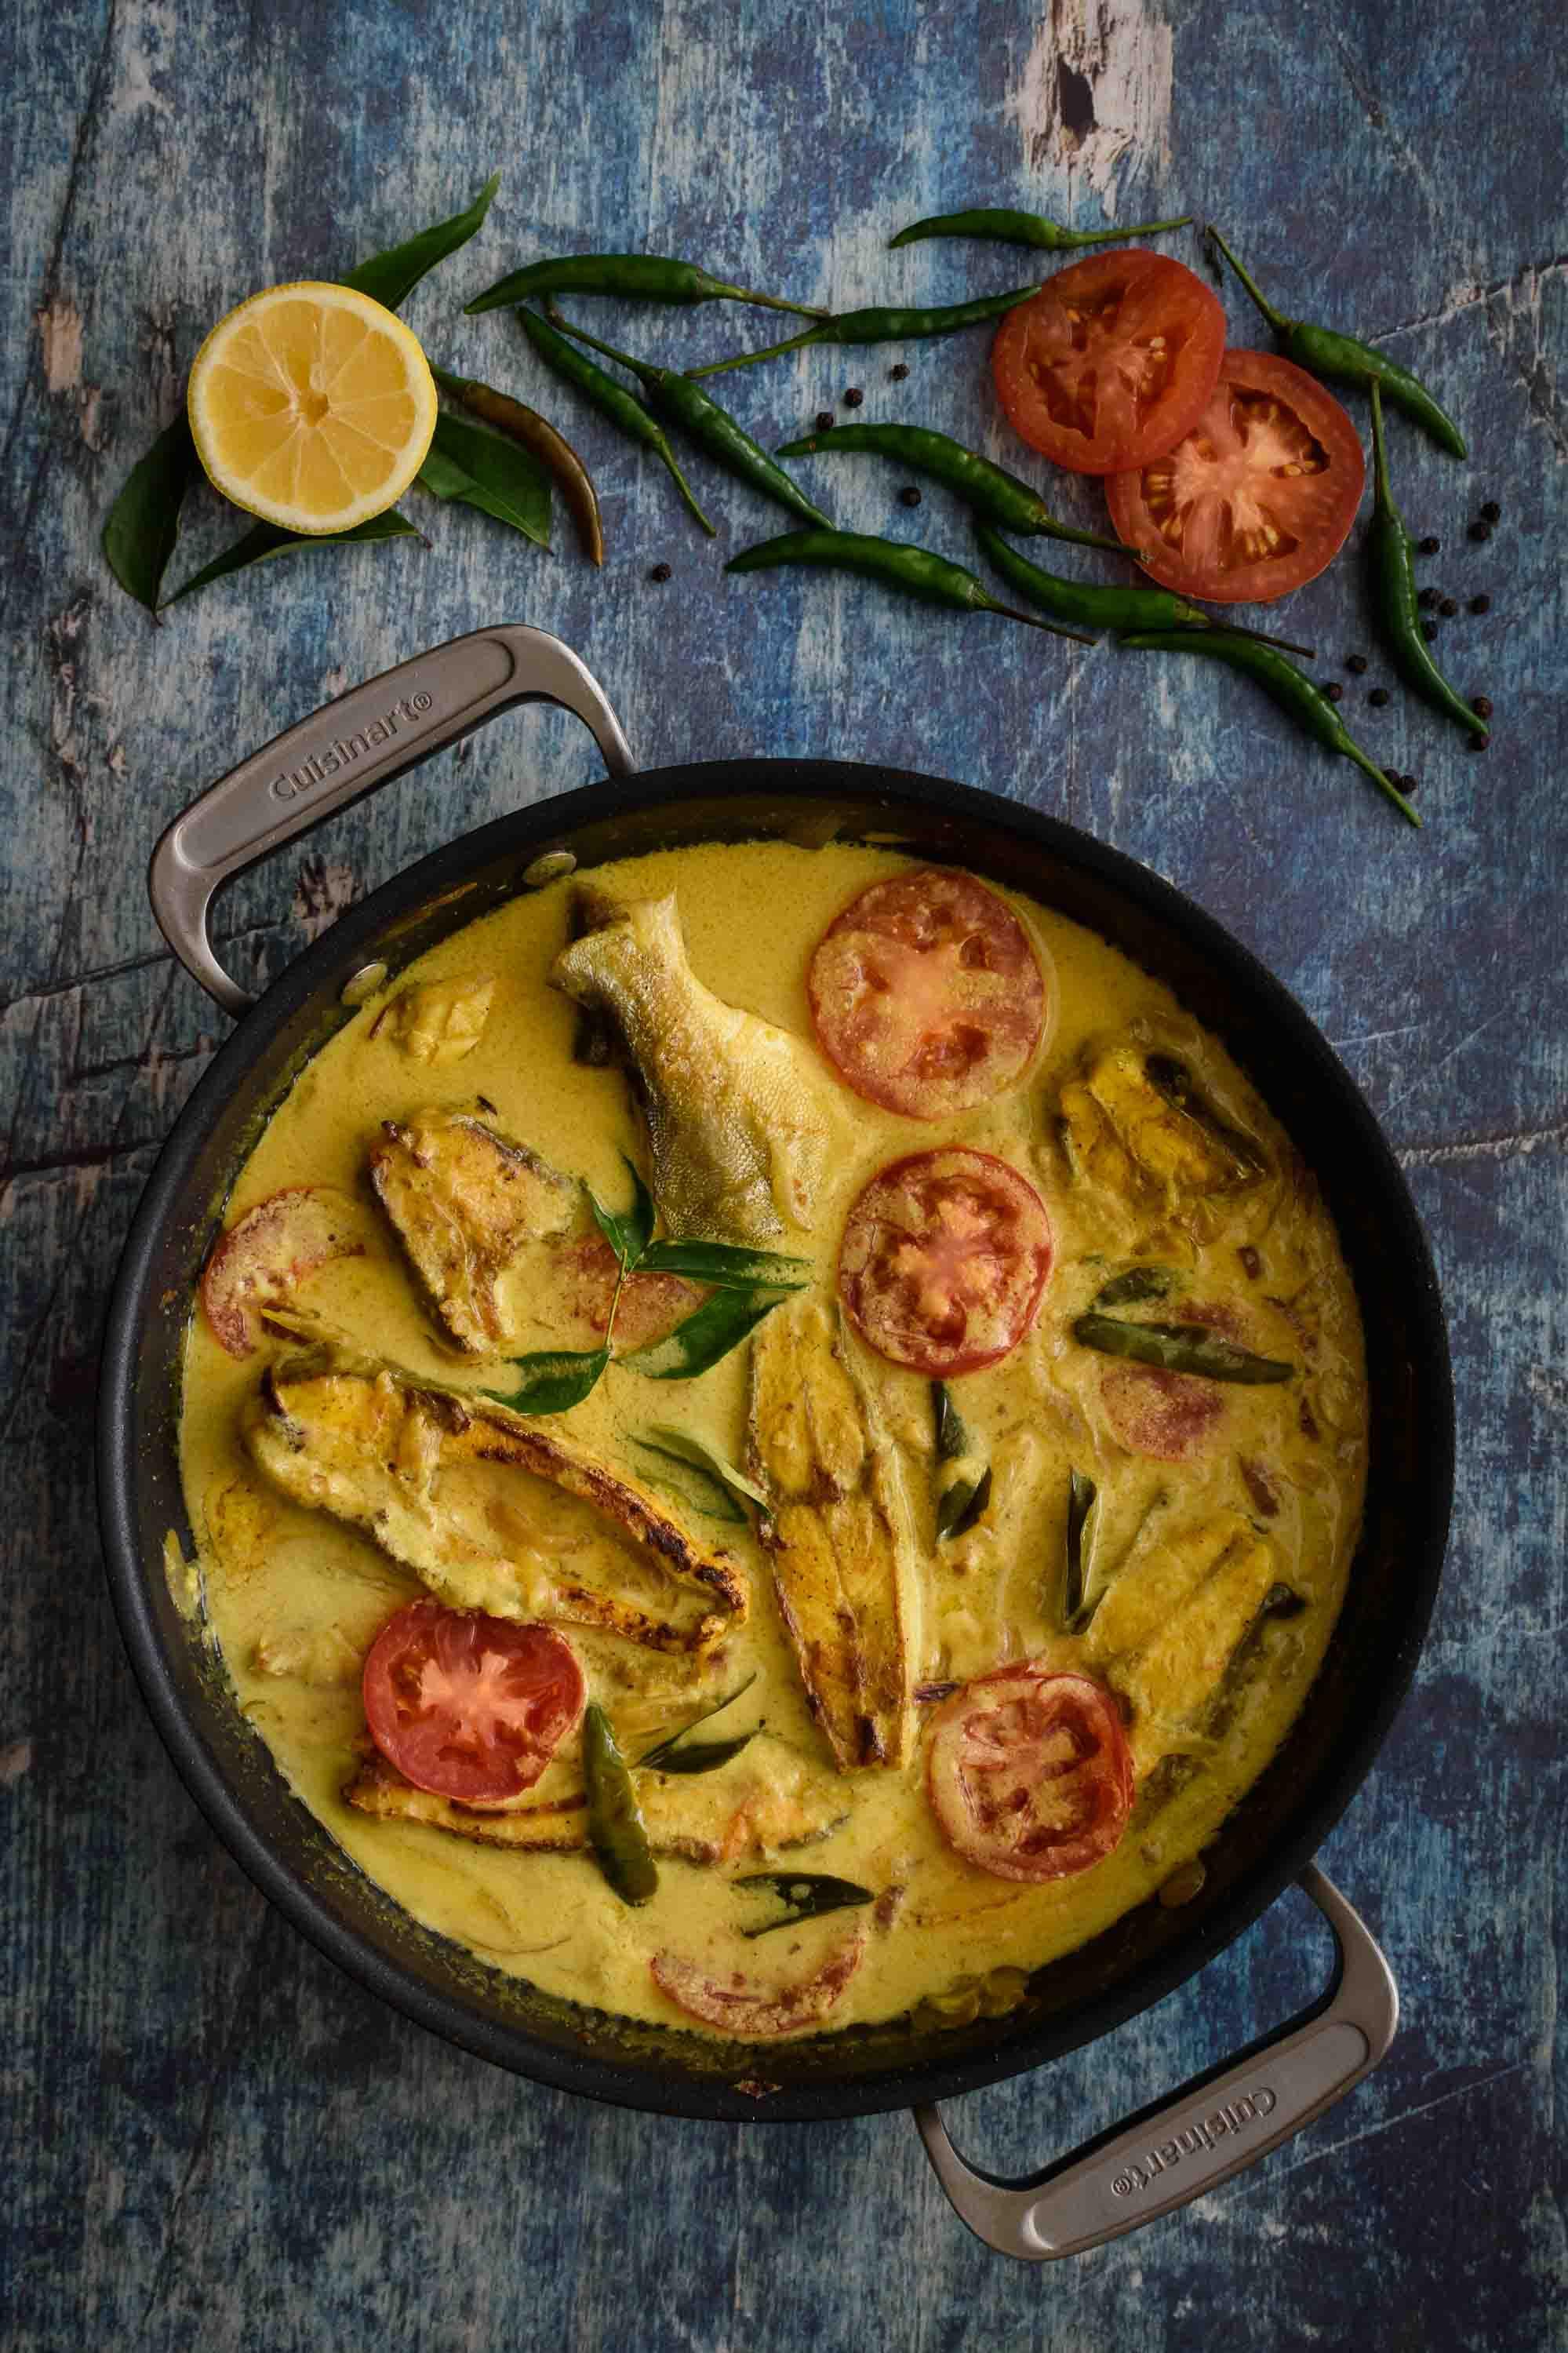 Fish Molly- Pepper Delight #pepperdelightblog #recipe #fishmolly #fishmolee #keralafood #keralastylefishcurry #nadanfood #indianrecipes #easter #meenmolly #christmas #seafood #fishrecipes #festivalrecipes #sidedish #fishmoilee #keralaeasterrecipes #fishstew